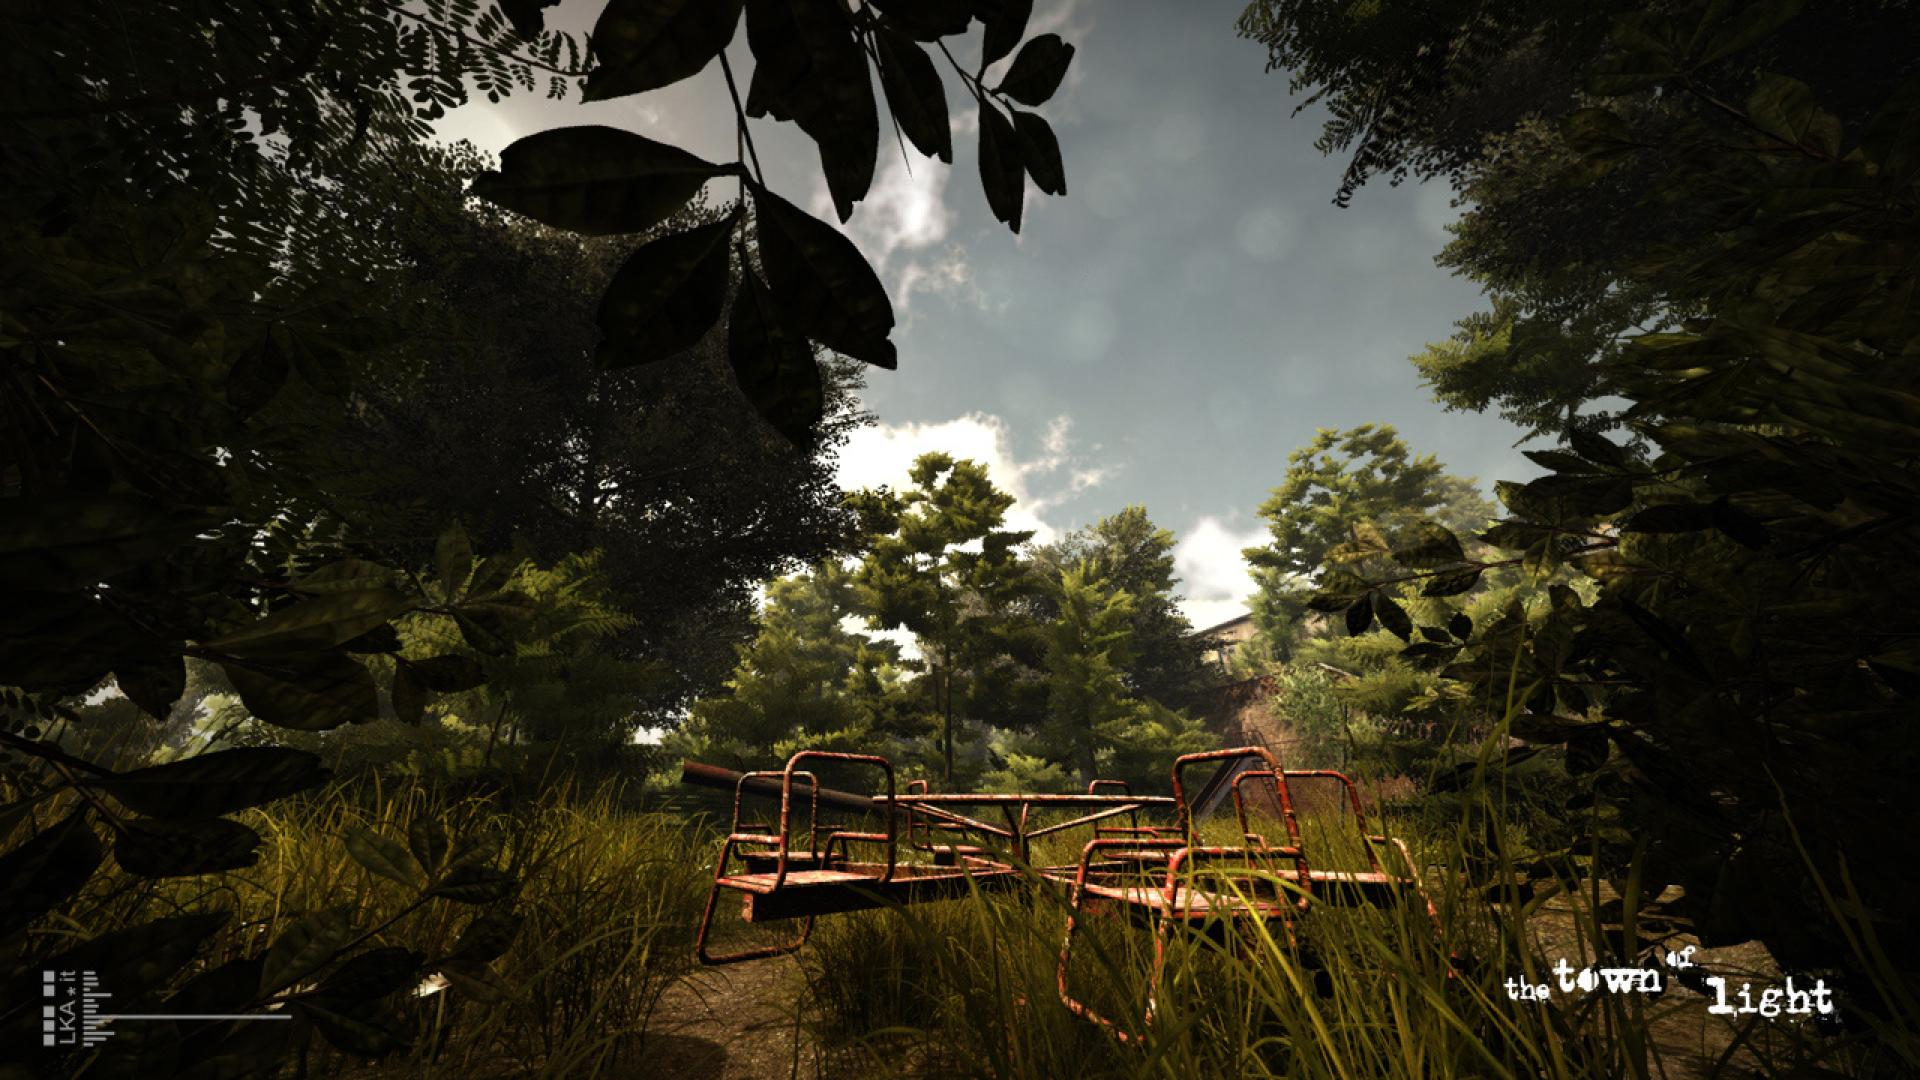 The Town of Light 1. kép